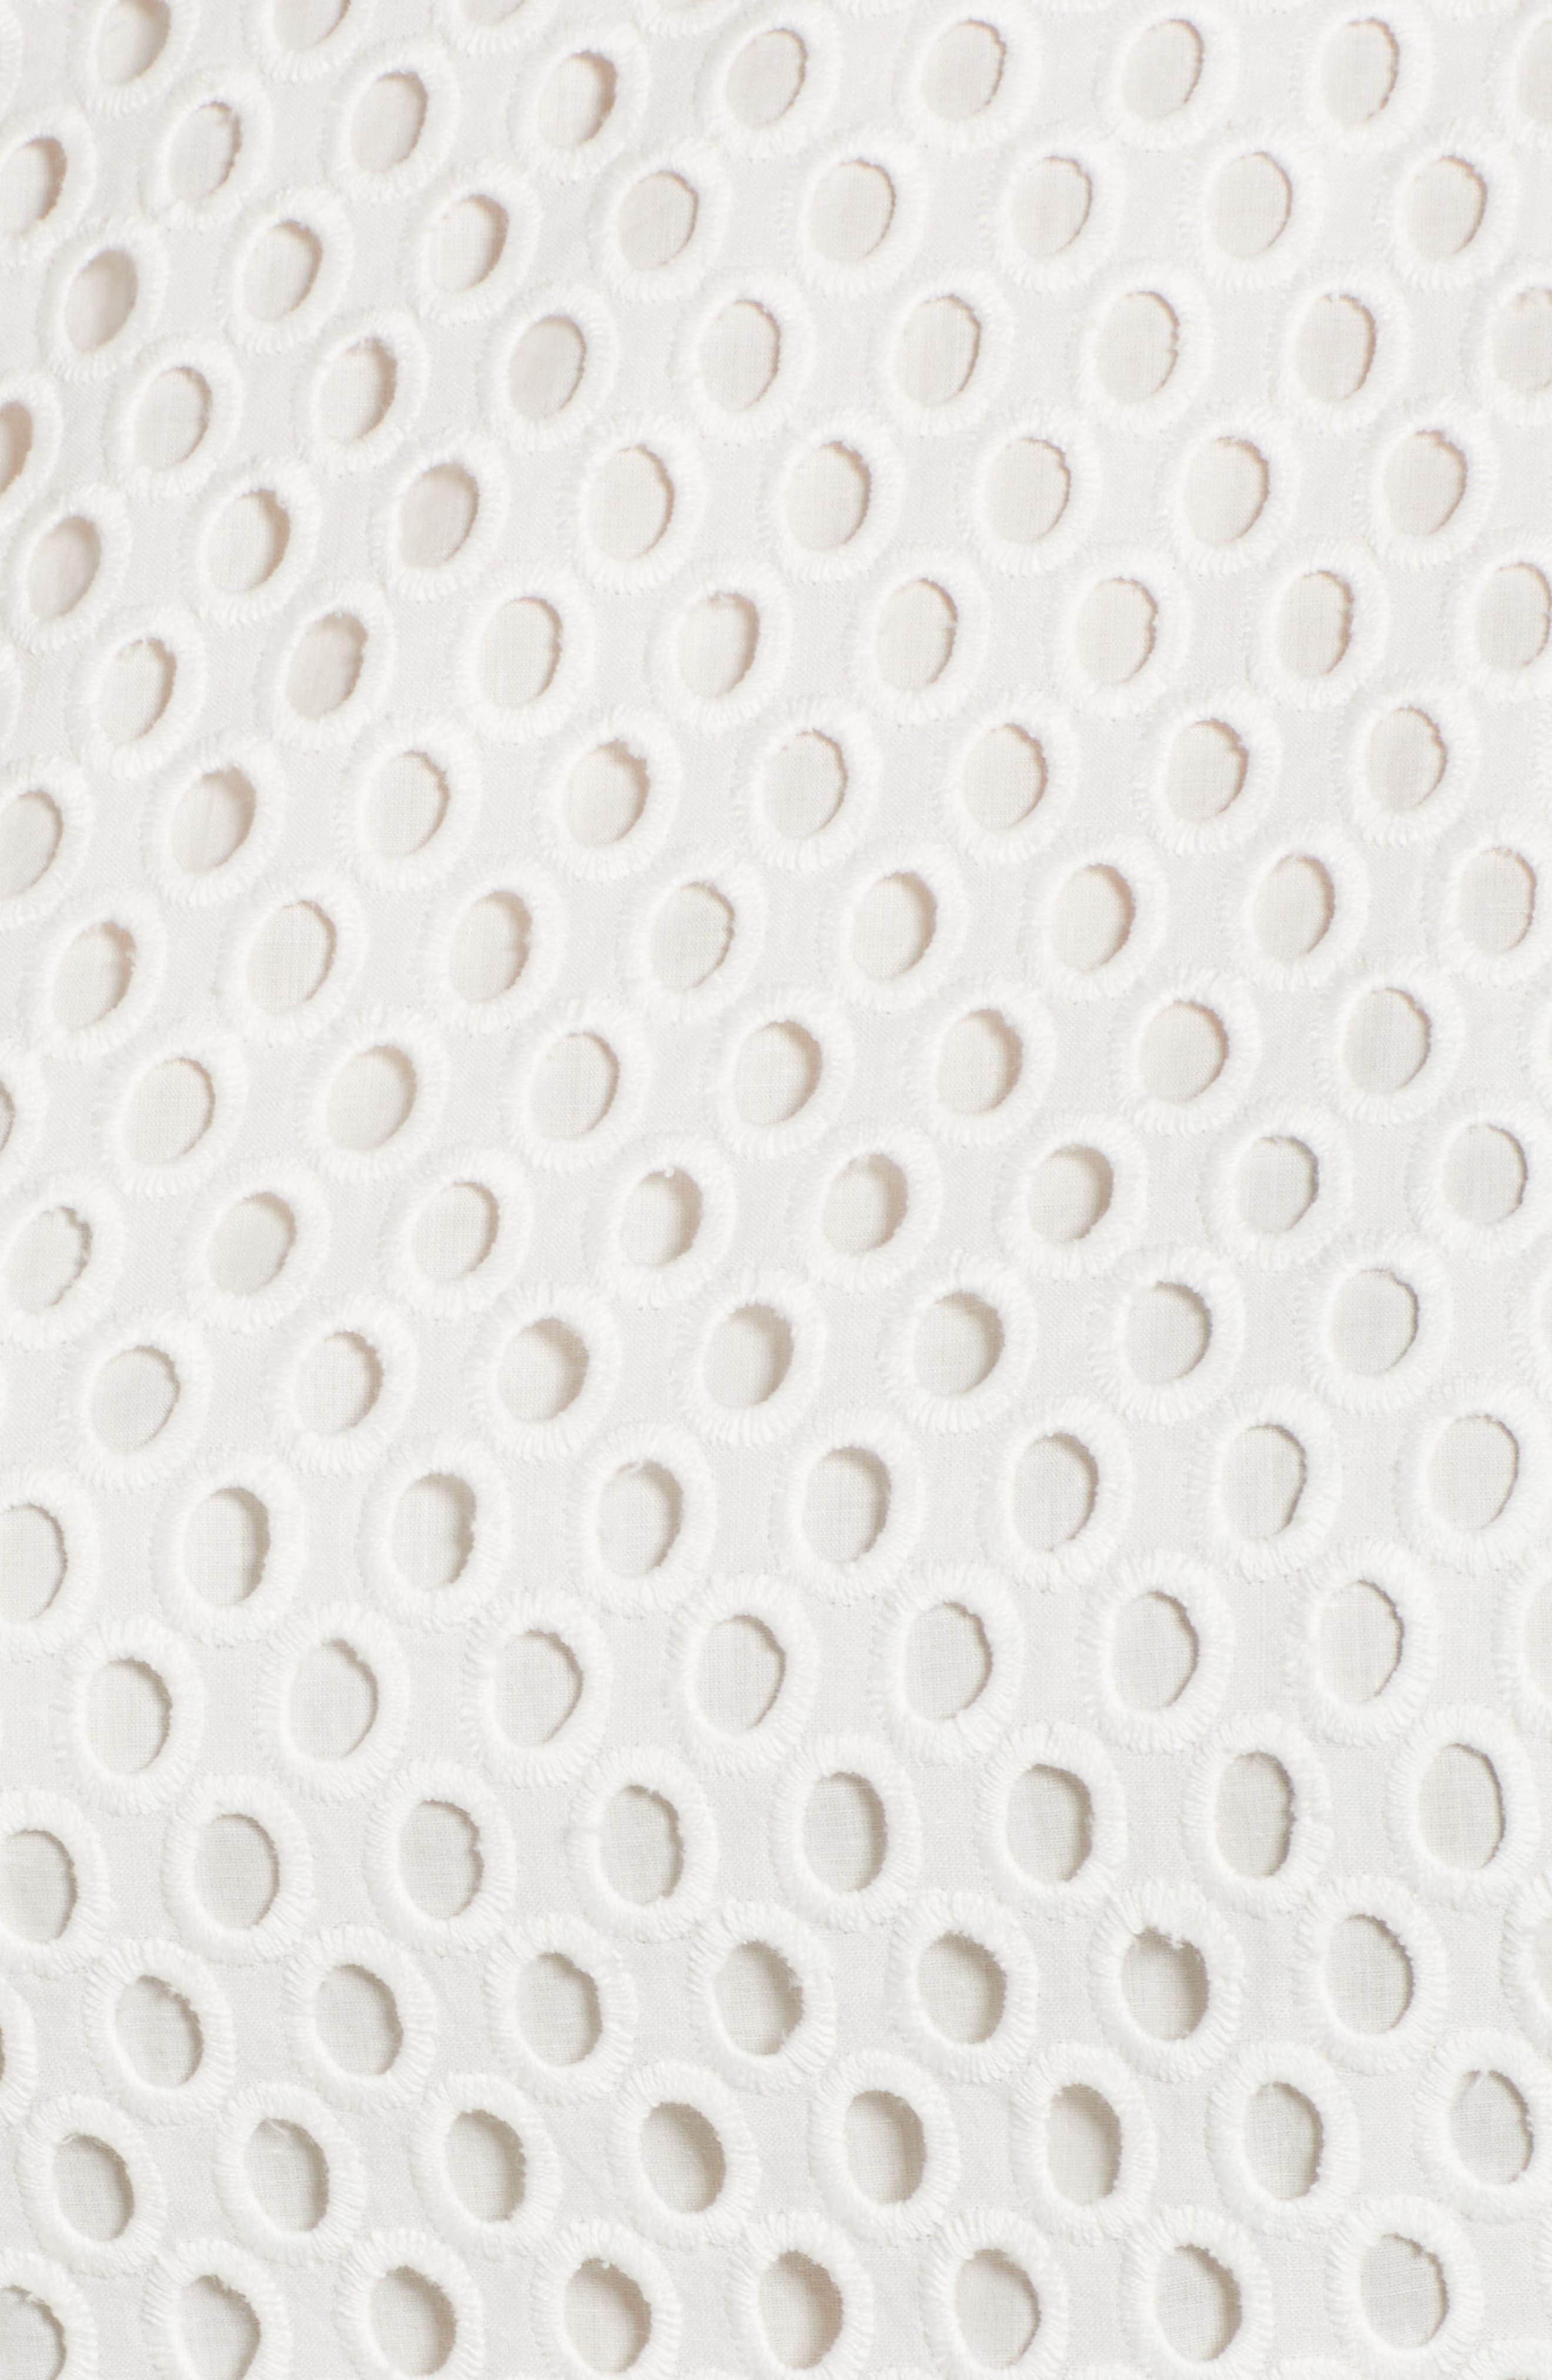 Dafalia Cotton Eyelet Dress,                             Alternate thumbnail 6, color,                             Vanilla Light